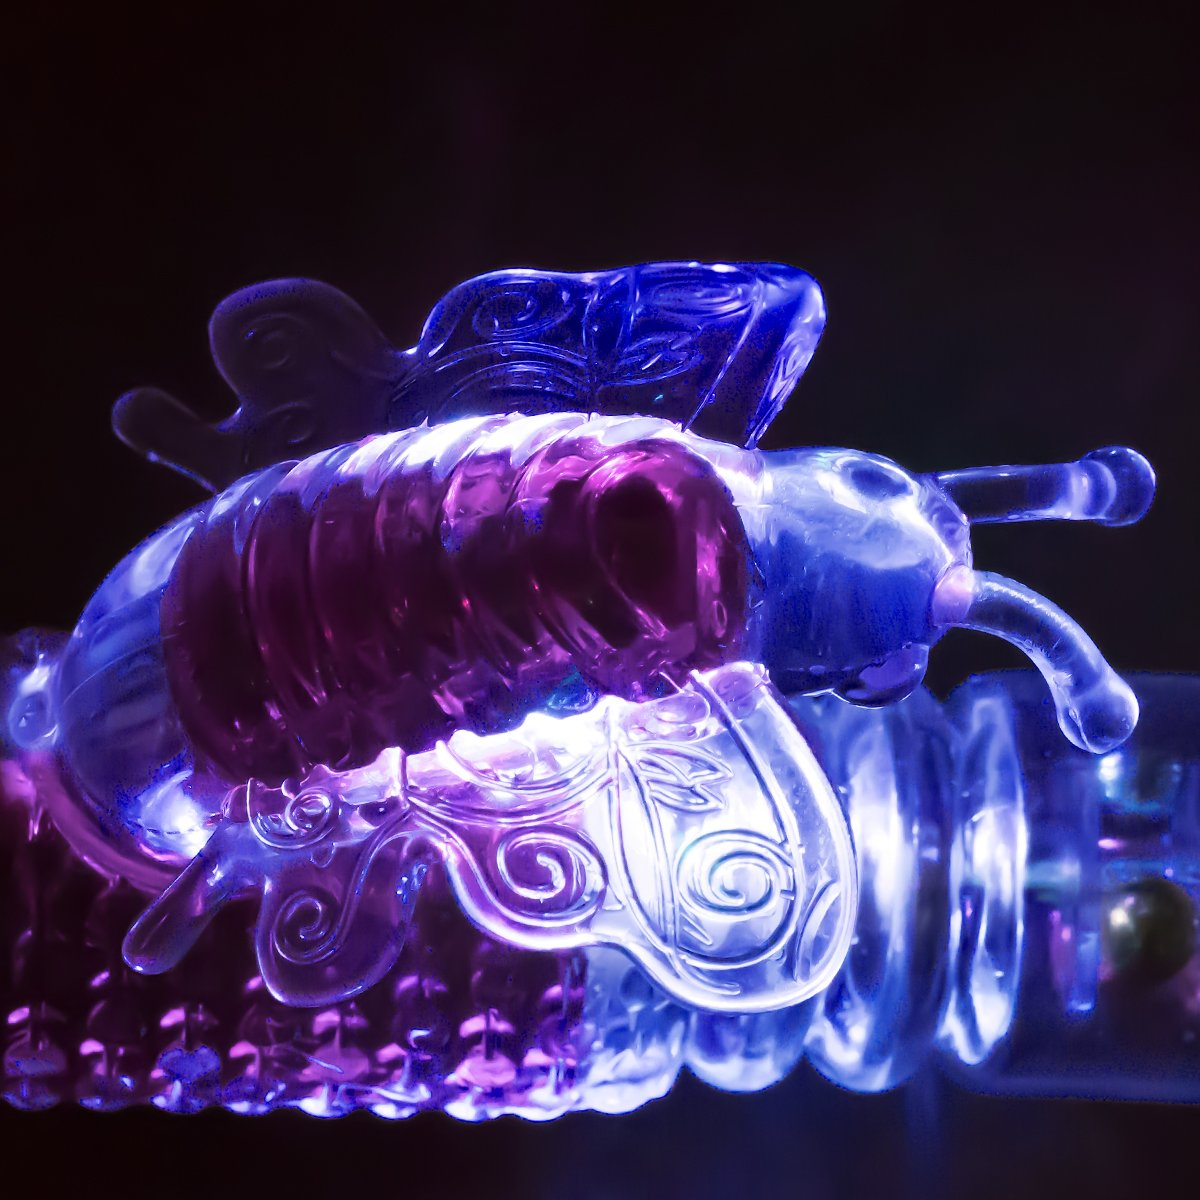 ZEMALIA Vibrating G-spot Vibrator - Vagina and Clitoris Stimulation Butterfly Massager - Powerful Rotating & Thrusting Dual Motors for Women or Couples (Purple)